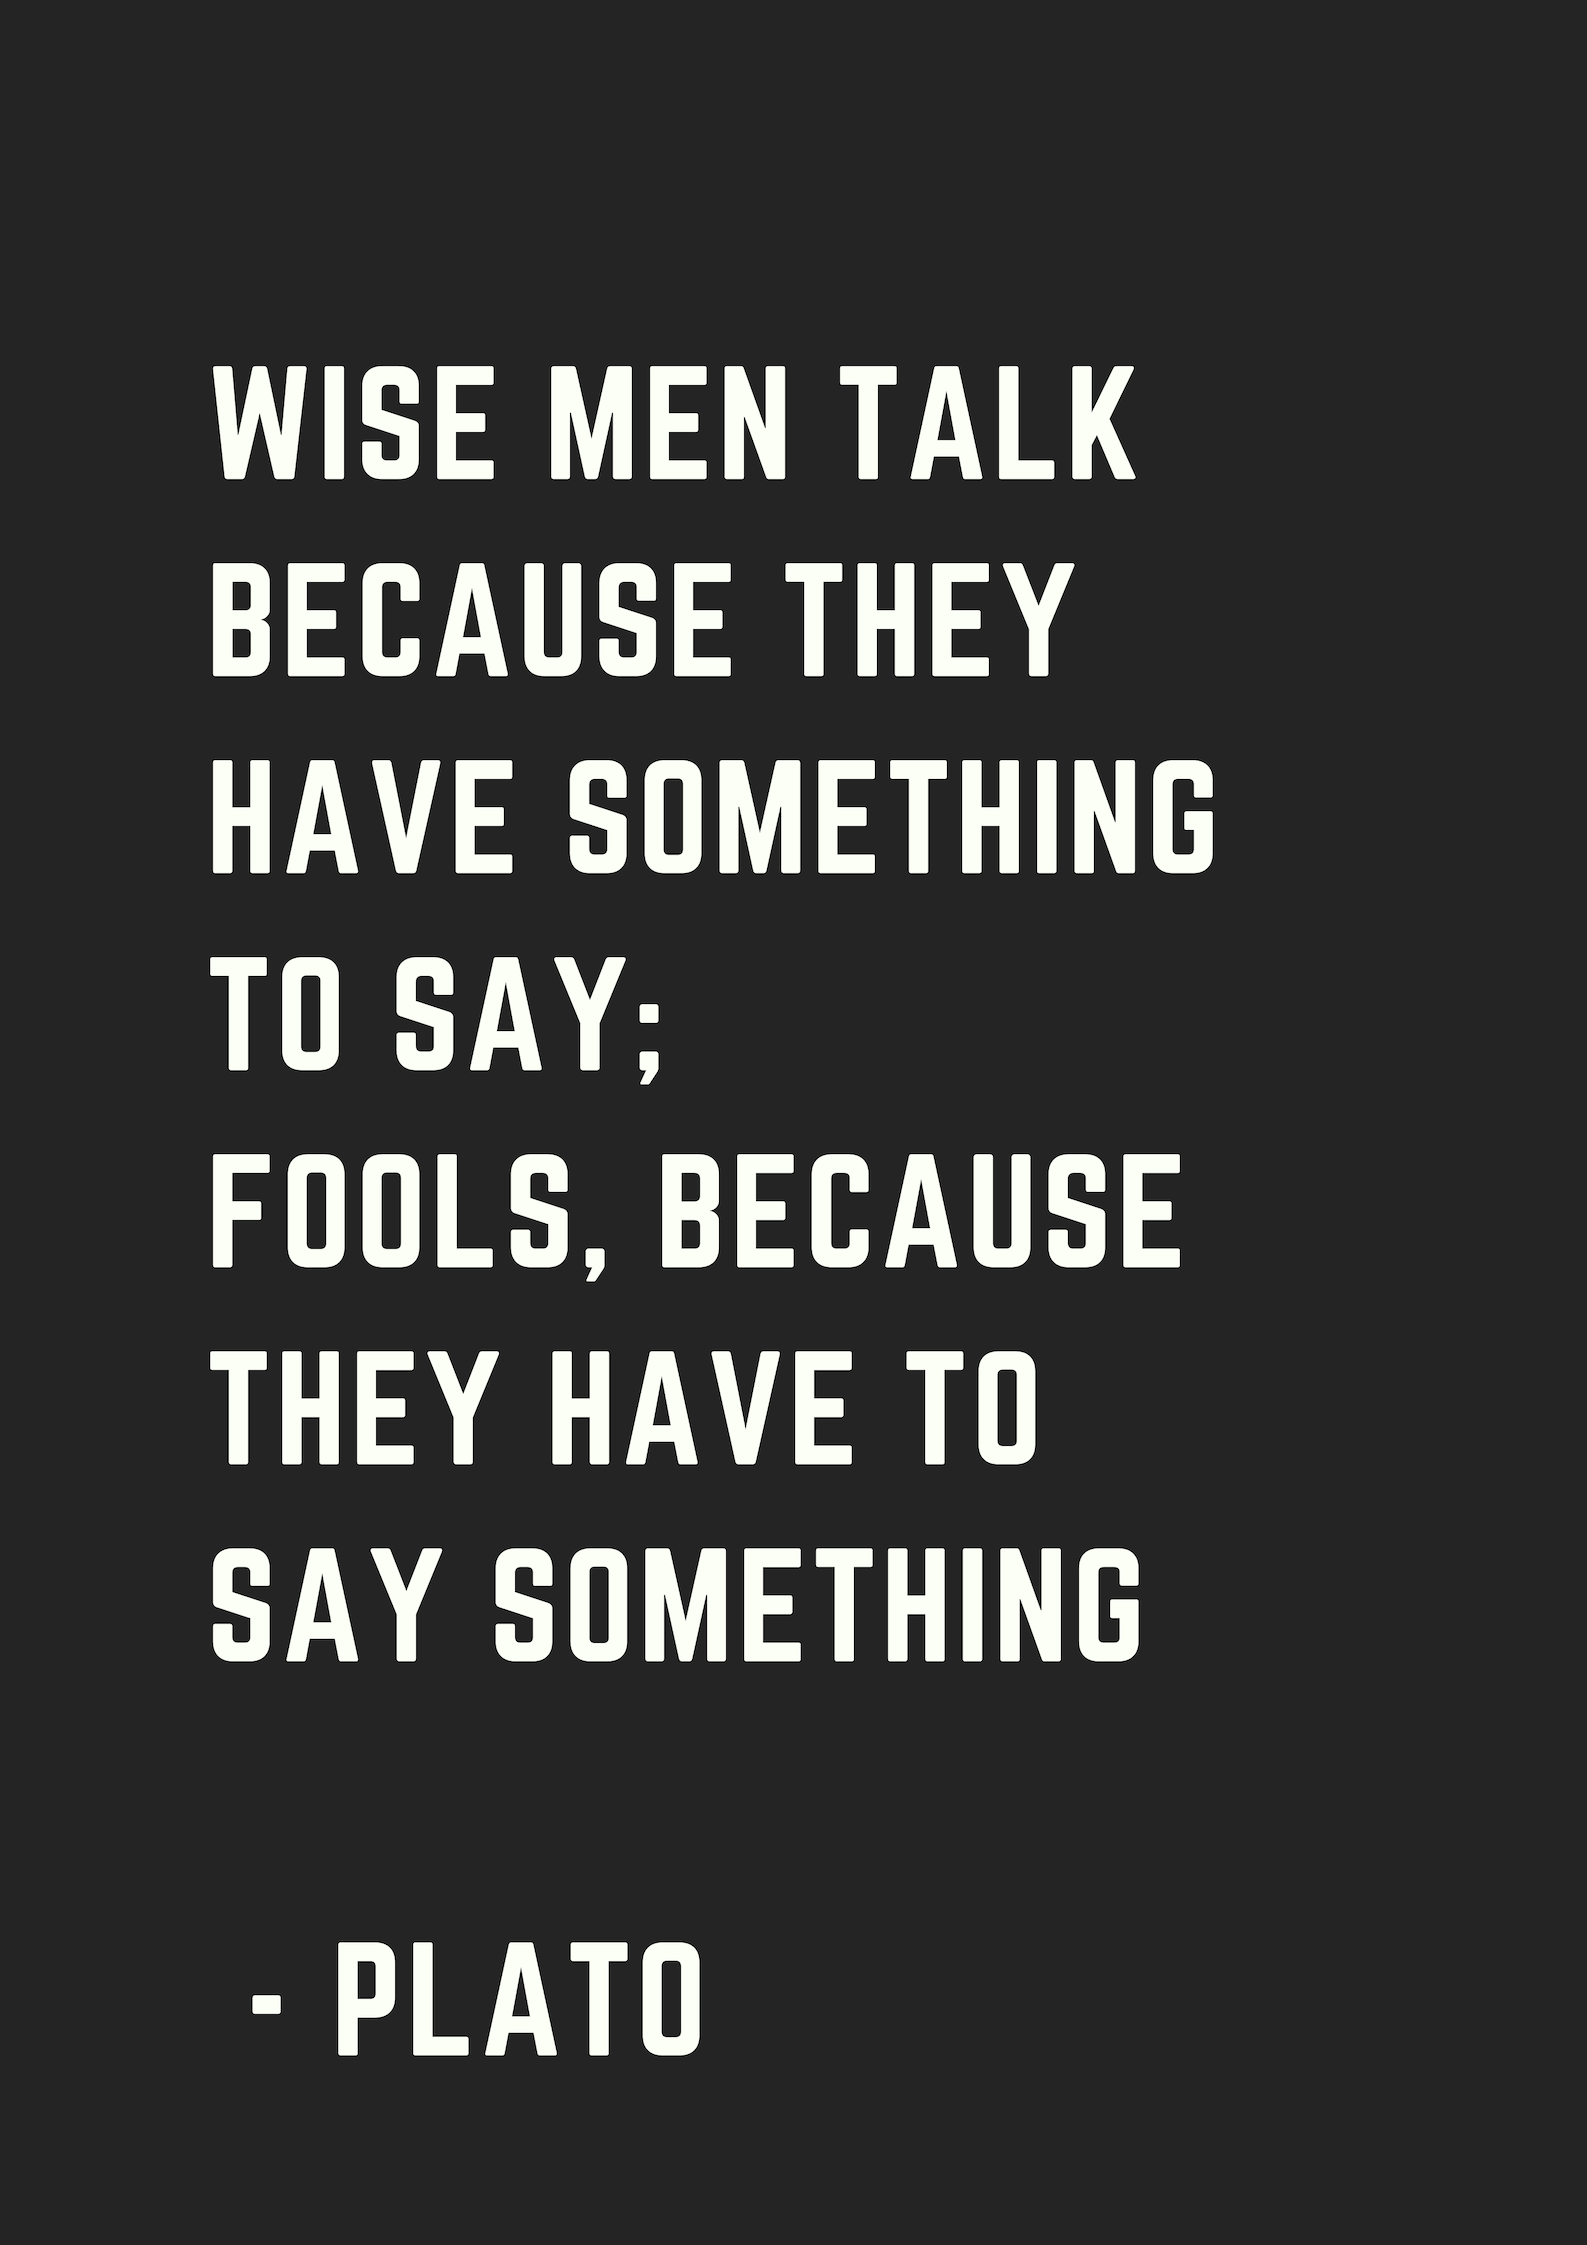 20 More Amazing Wisdom Quotes Trish Tips And Fun Stuff